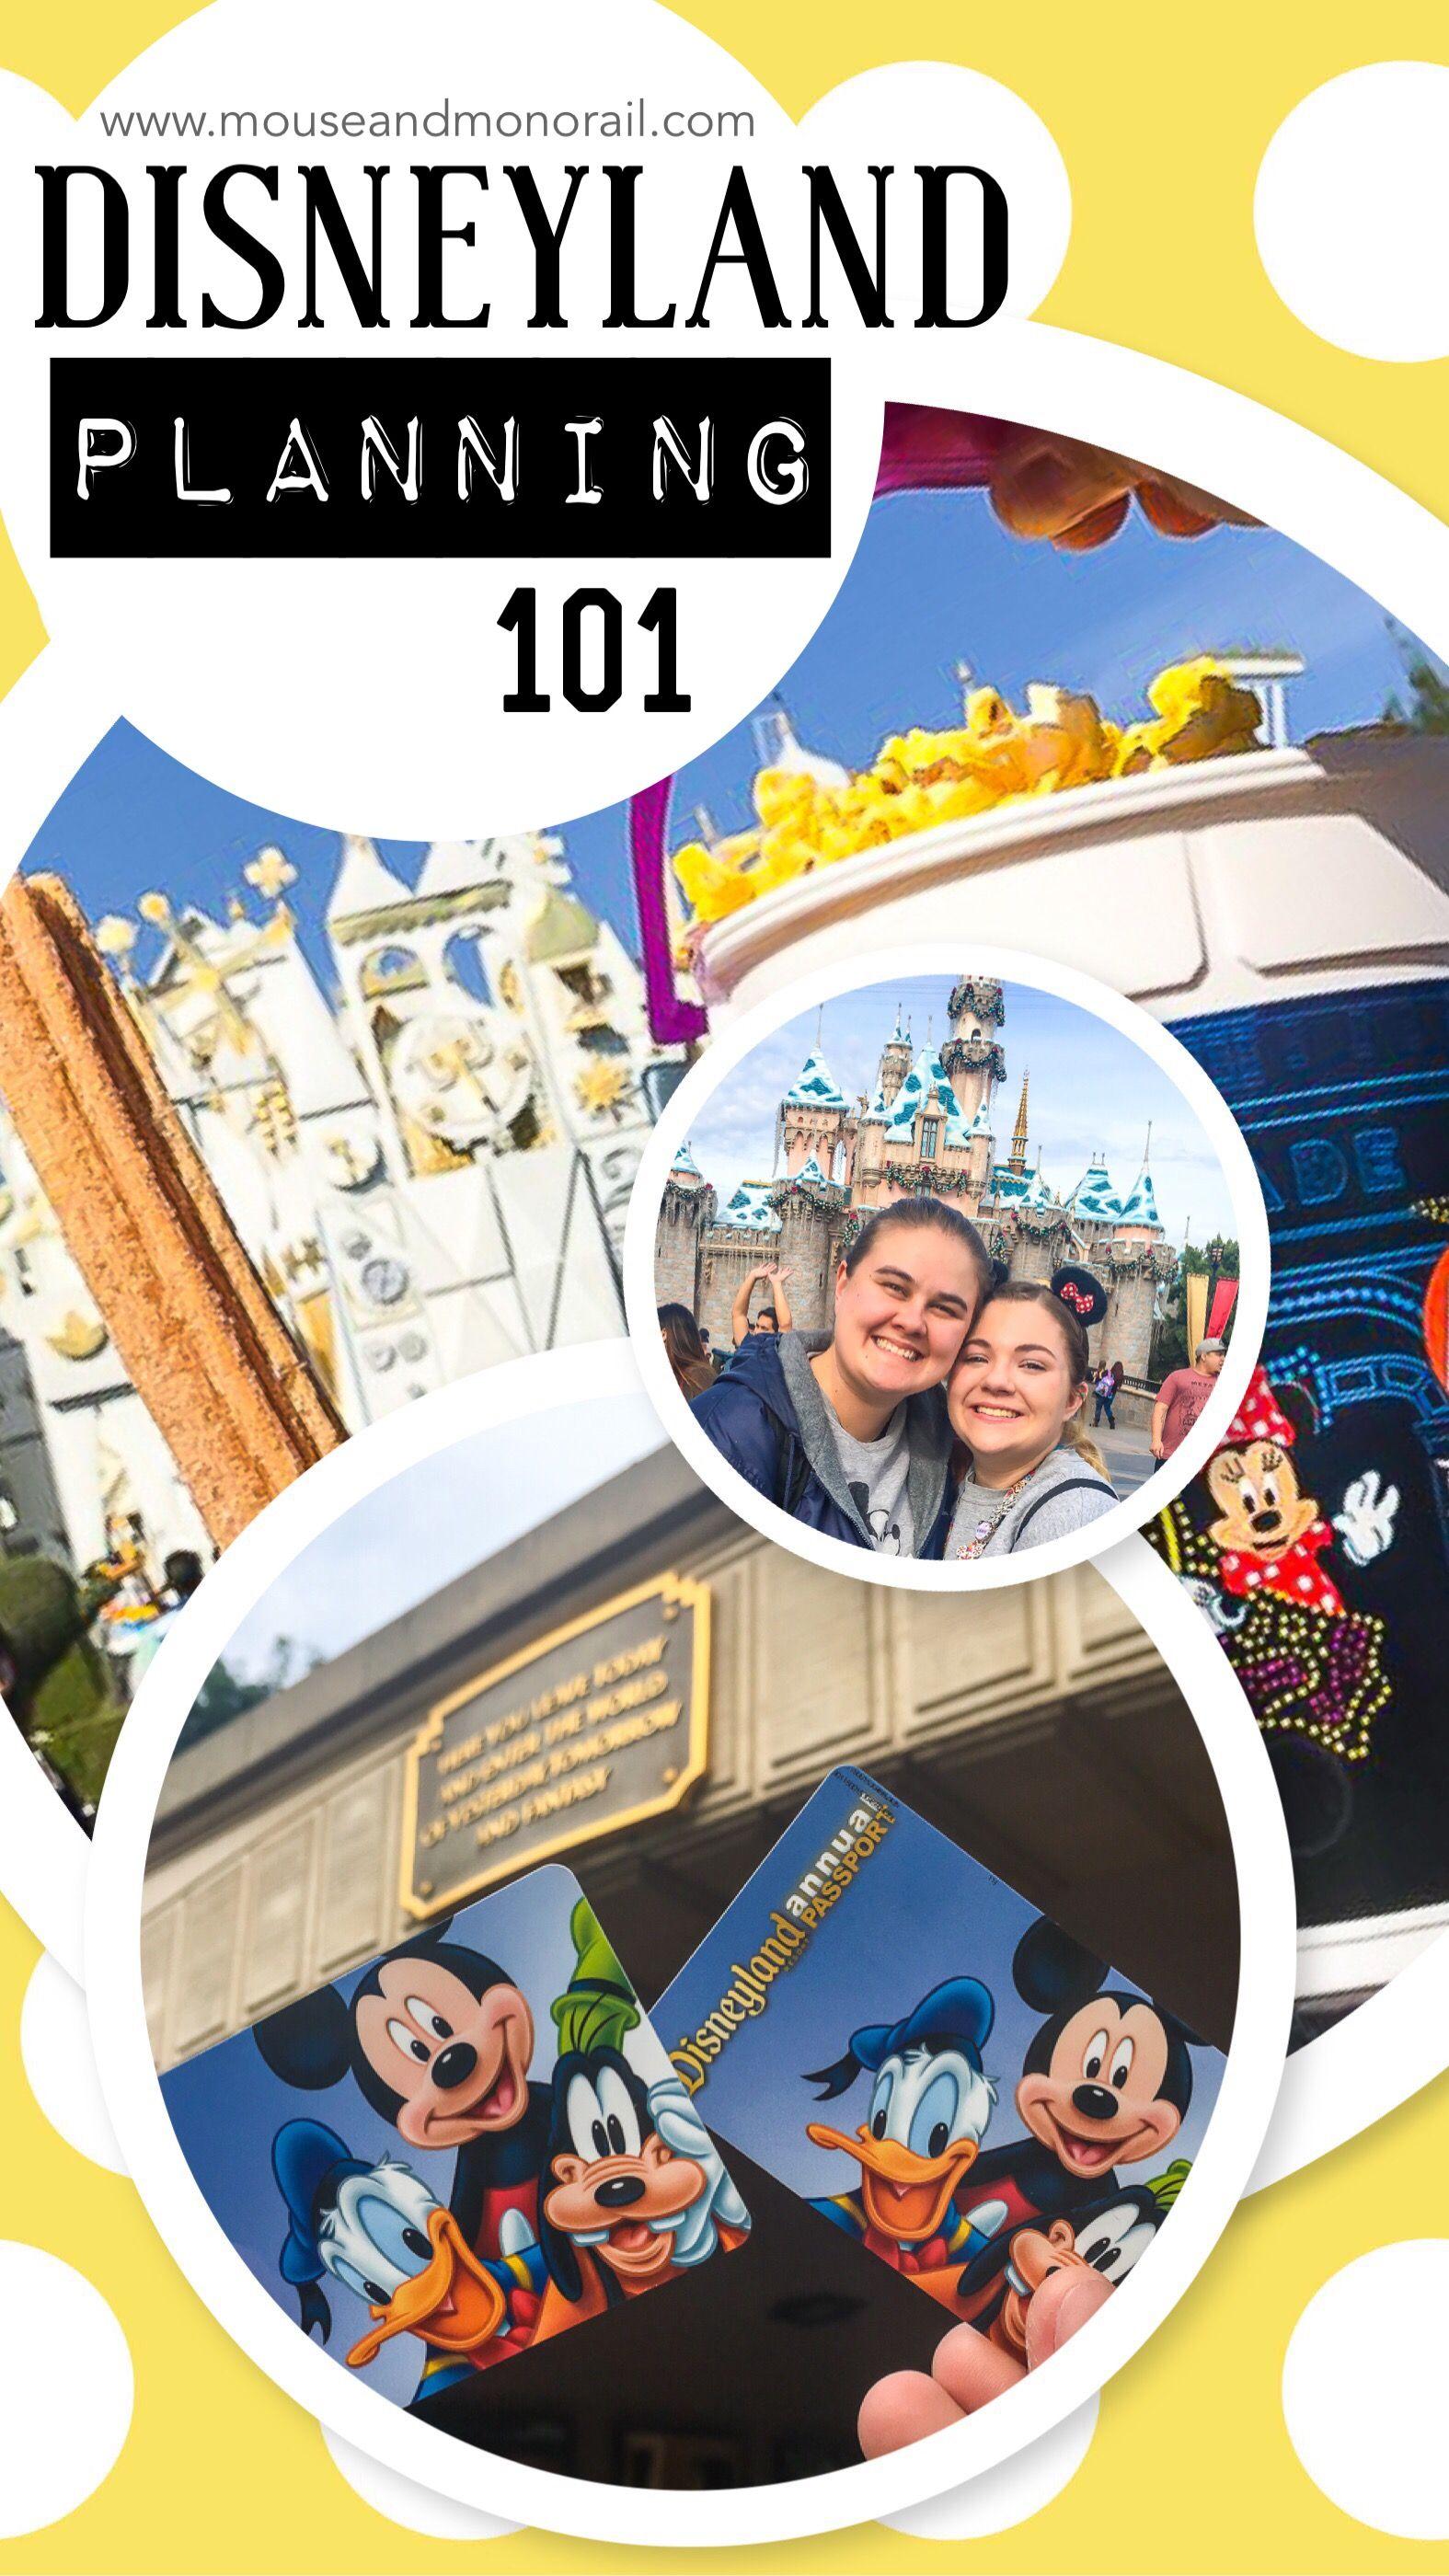 Disneyland Planning Best Tips From An Annual Passholder